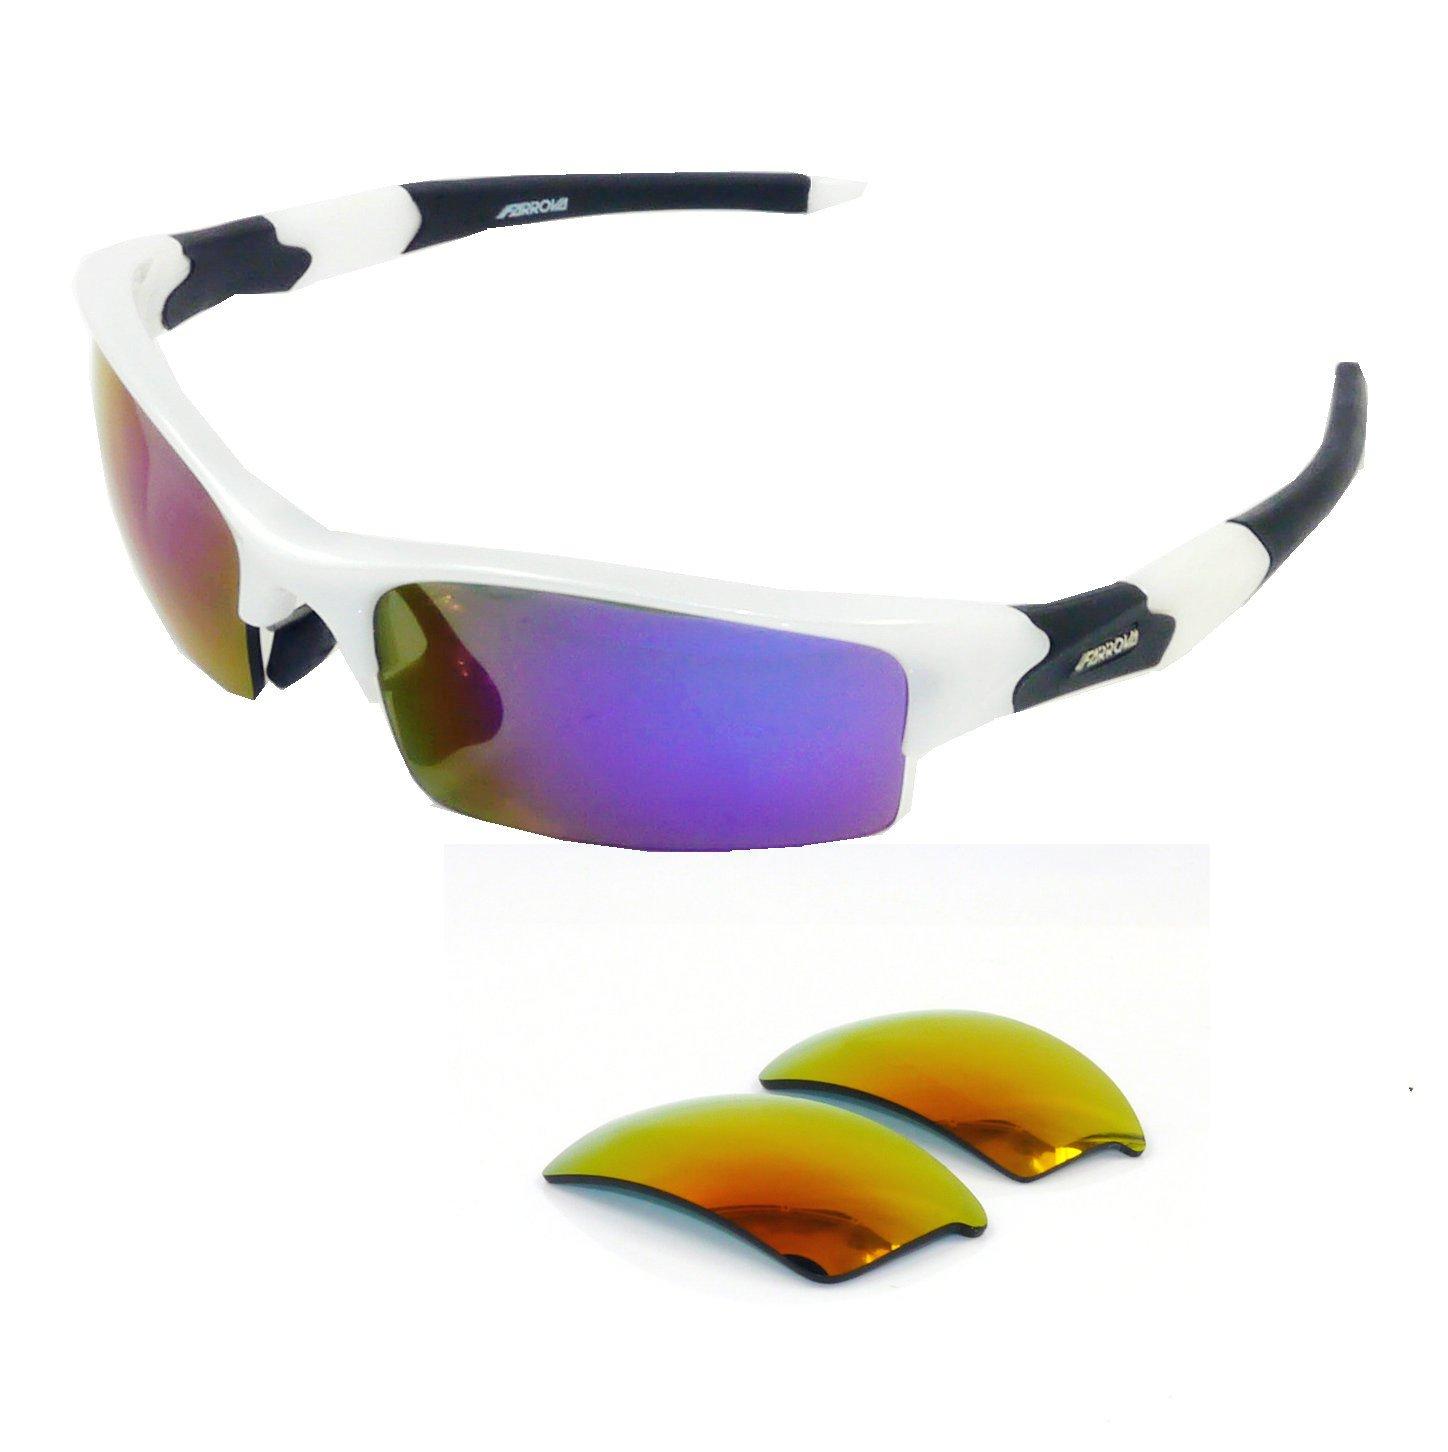 9cb9e717e1c FARROVA - AX5062Extreme Series Polarized Sunglasses Cycling Grilamid TR90 Frame  Sports Sunglasses for Men   Women with Interchangeable Iridium Lenses for  ...